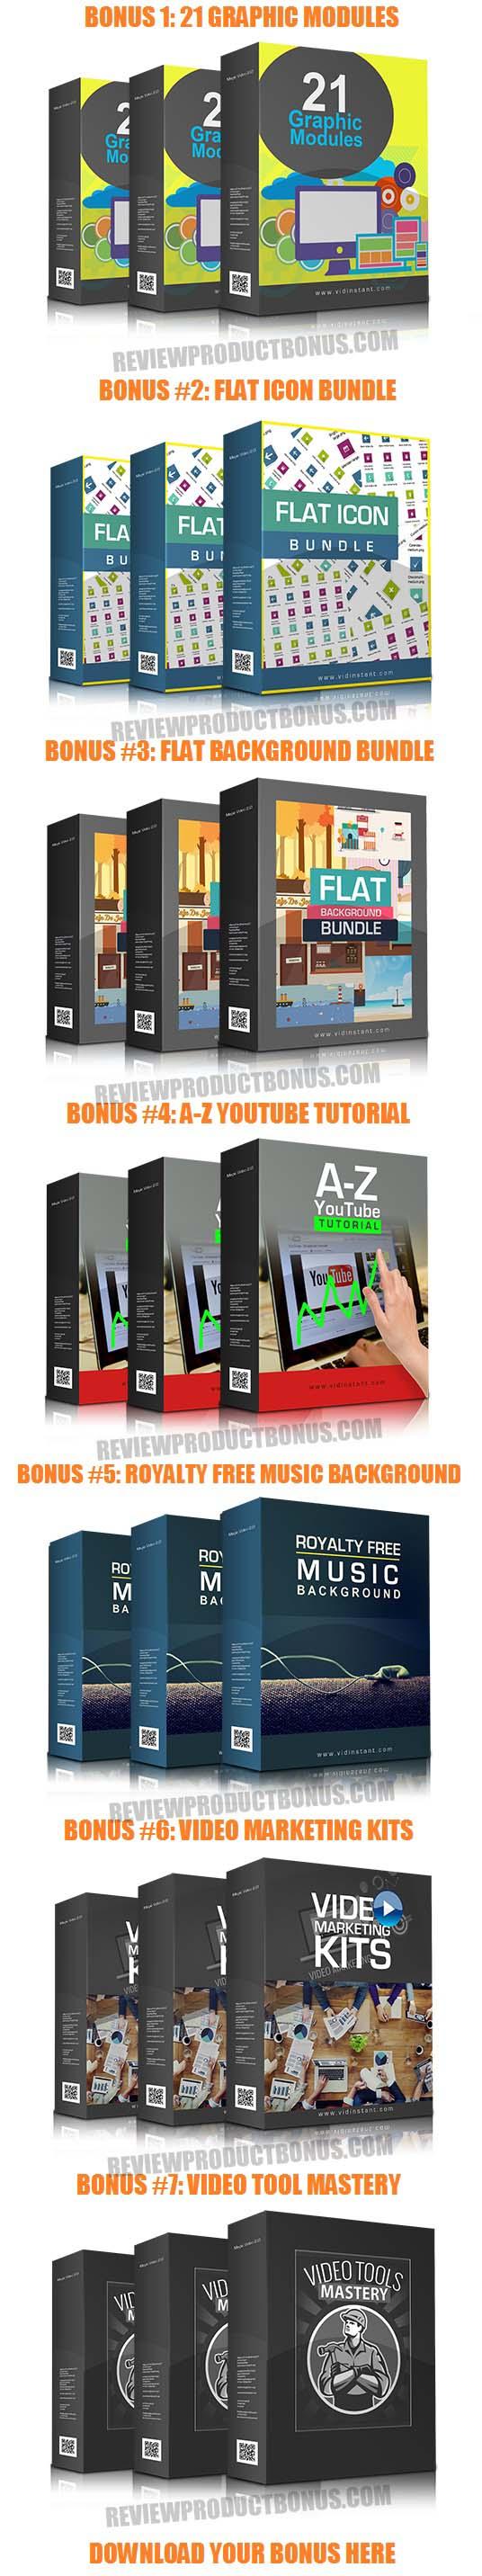 Victory Pro Bonus